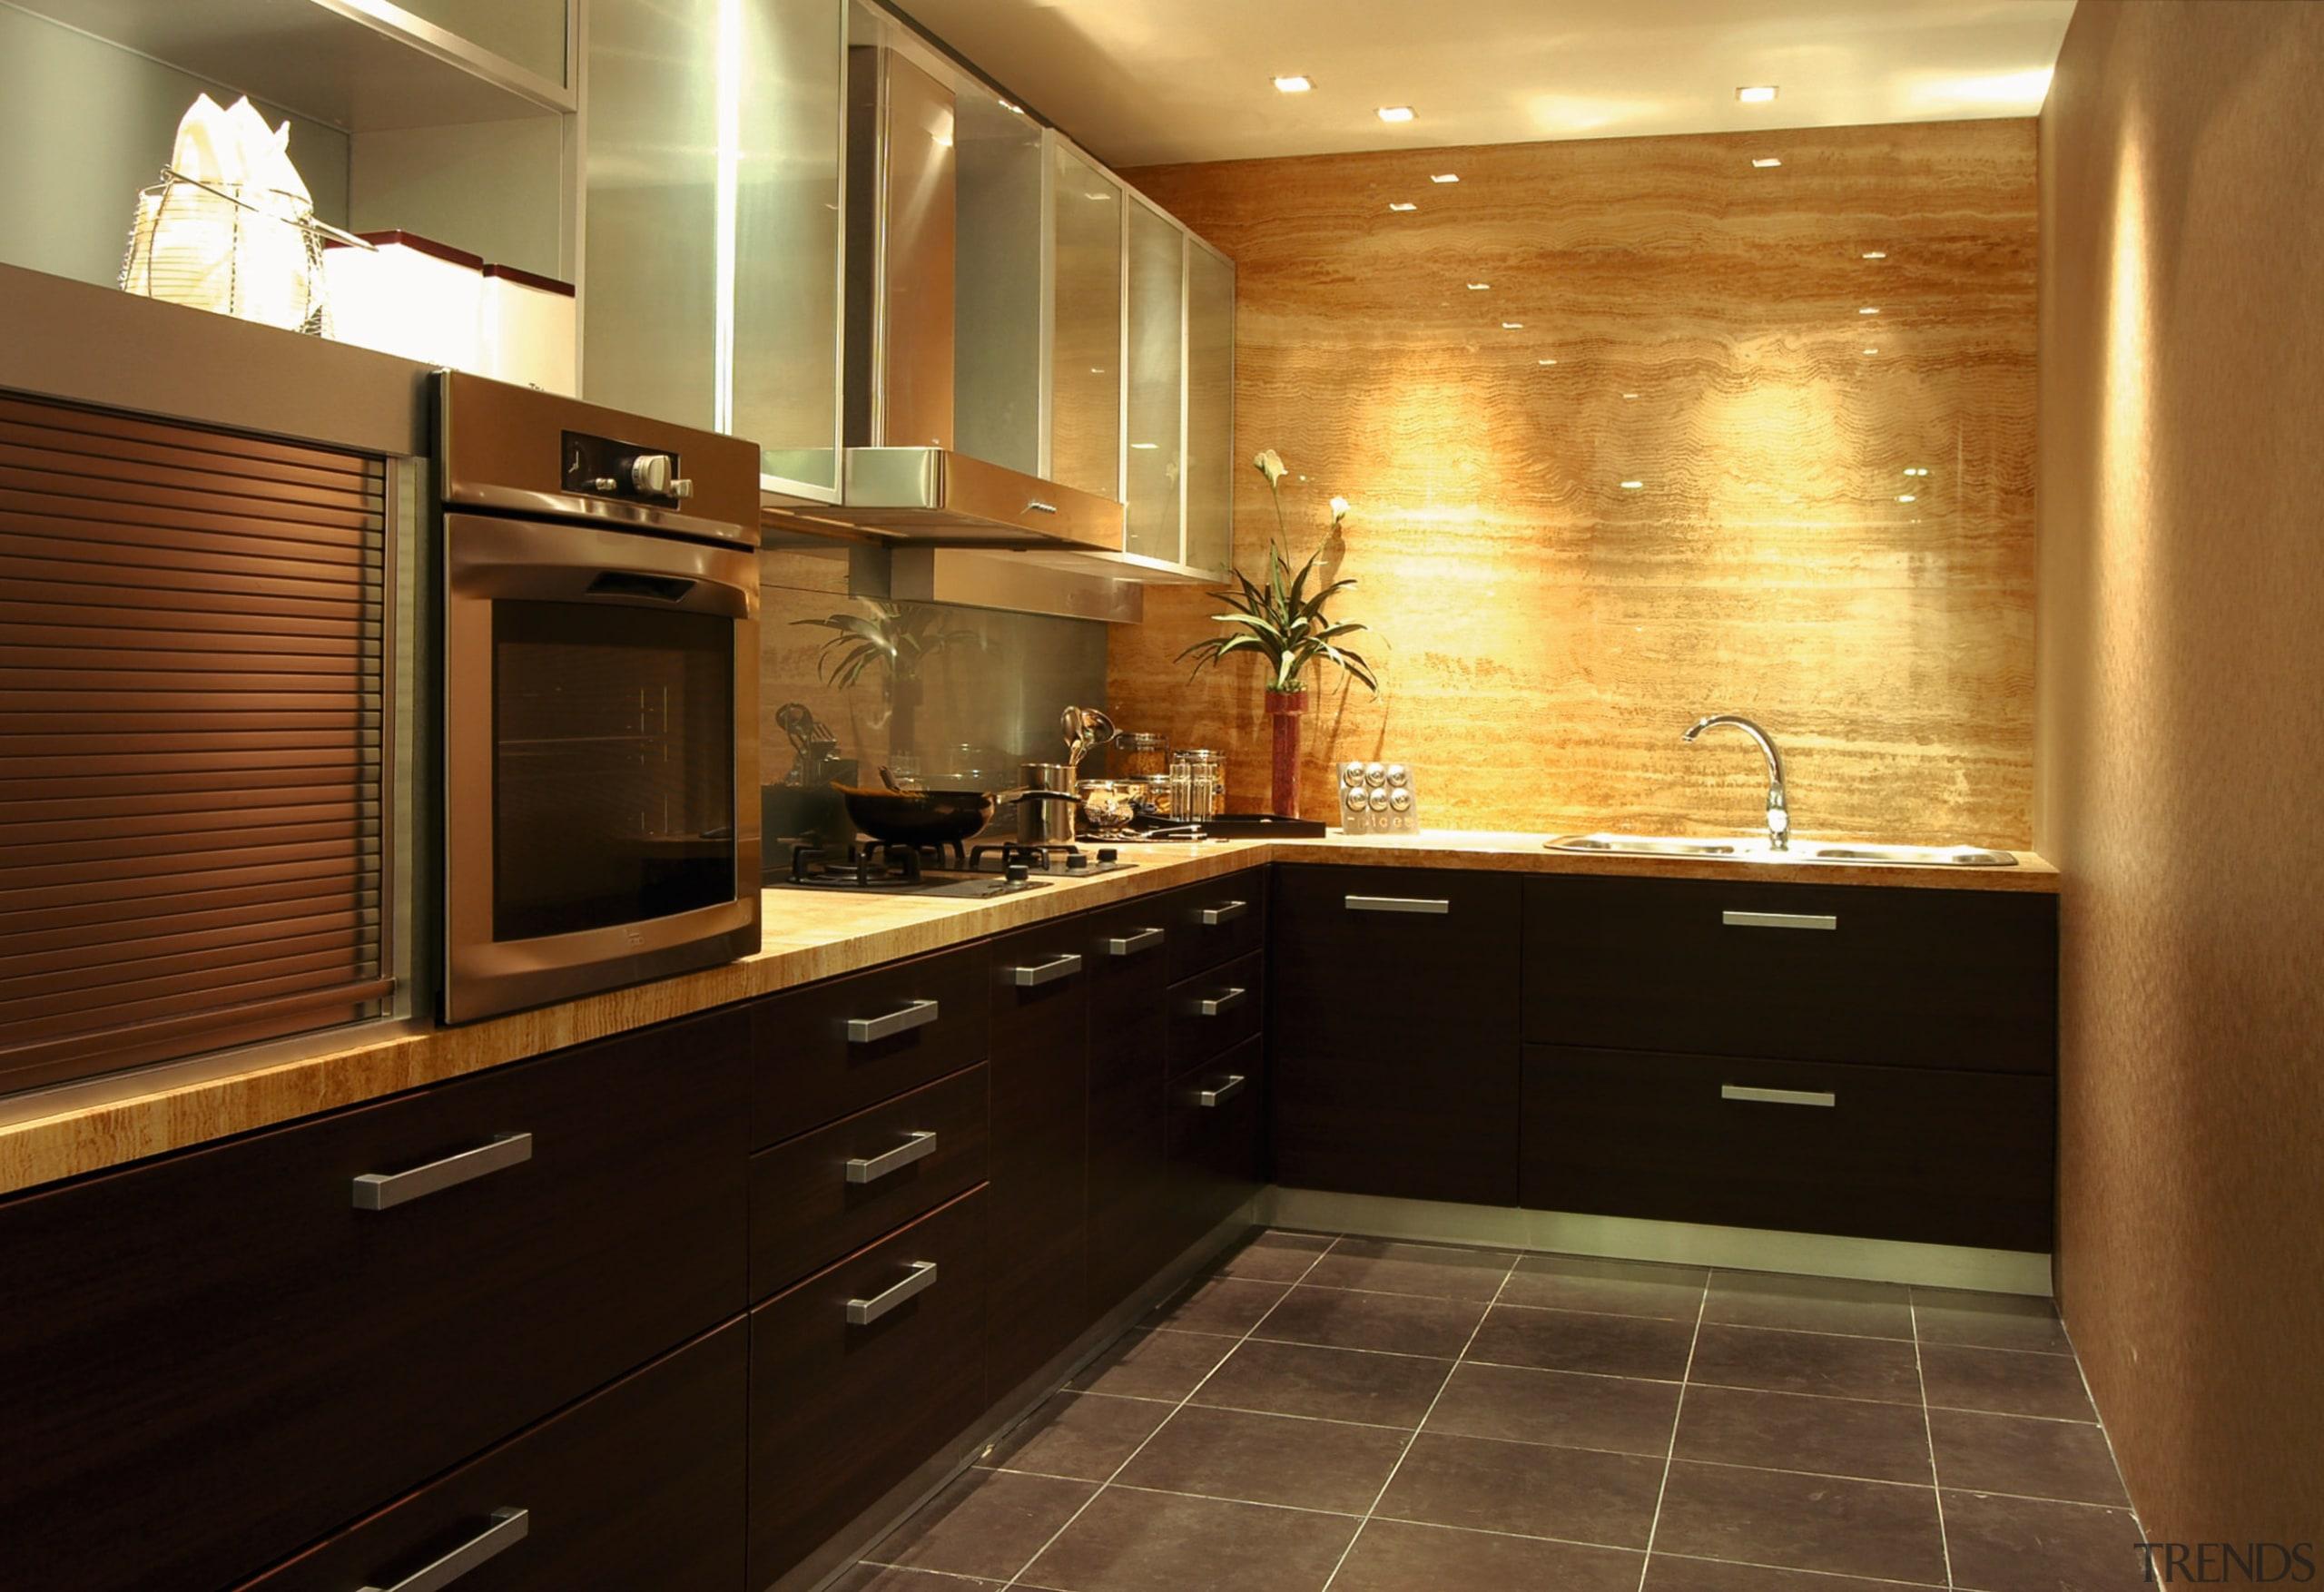 view of this kitchen from Art et Domain cabinetry, countertop, cuisine classique, floor, flooring, interior design, kitchen, room, under cabinet lighting, brown, black